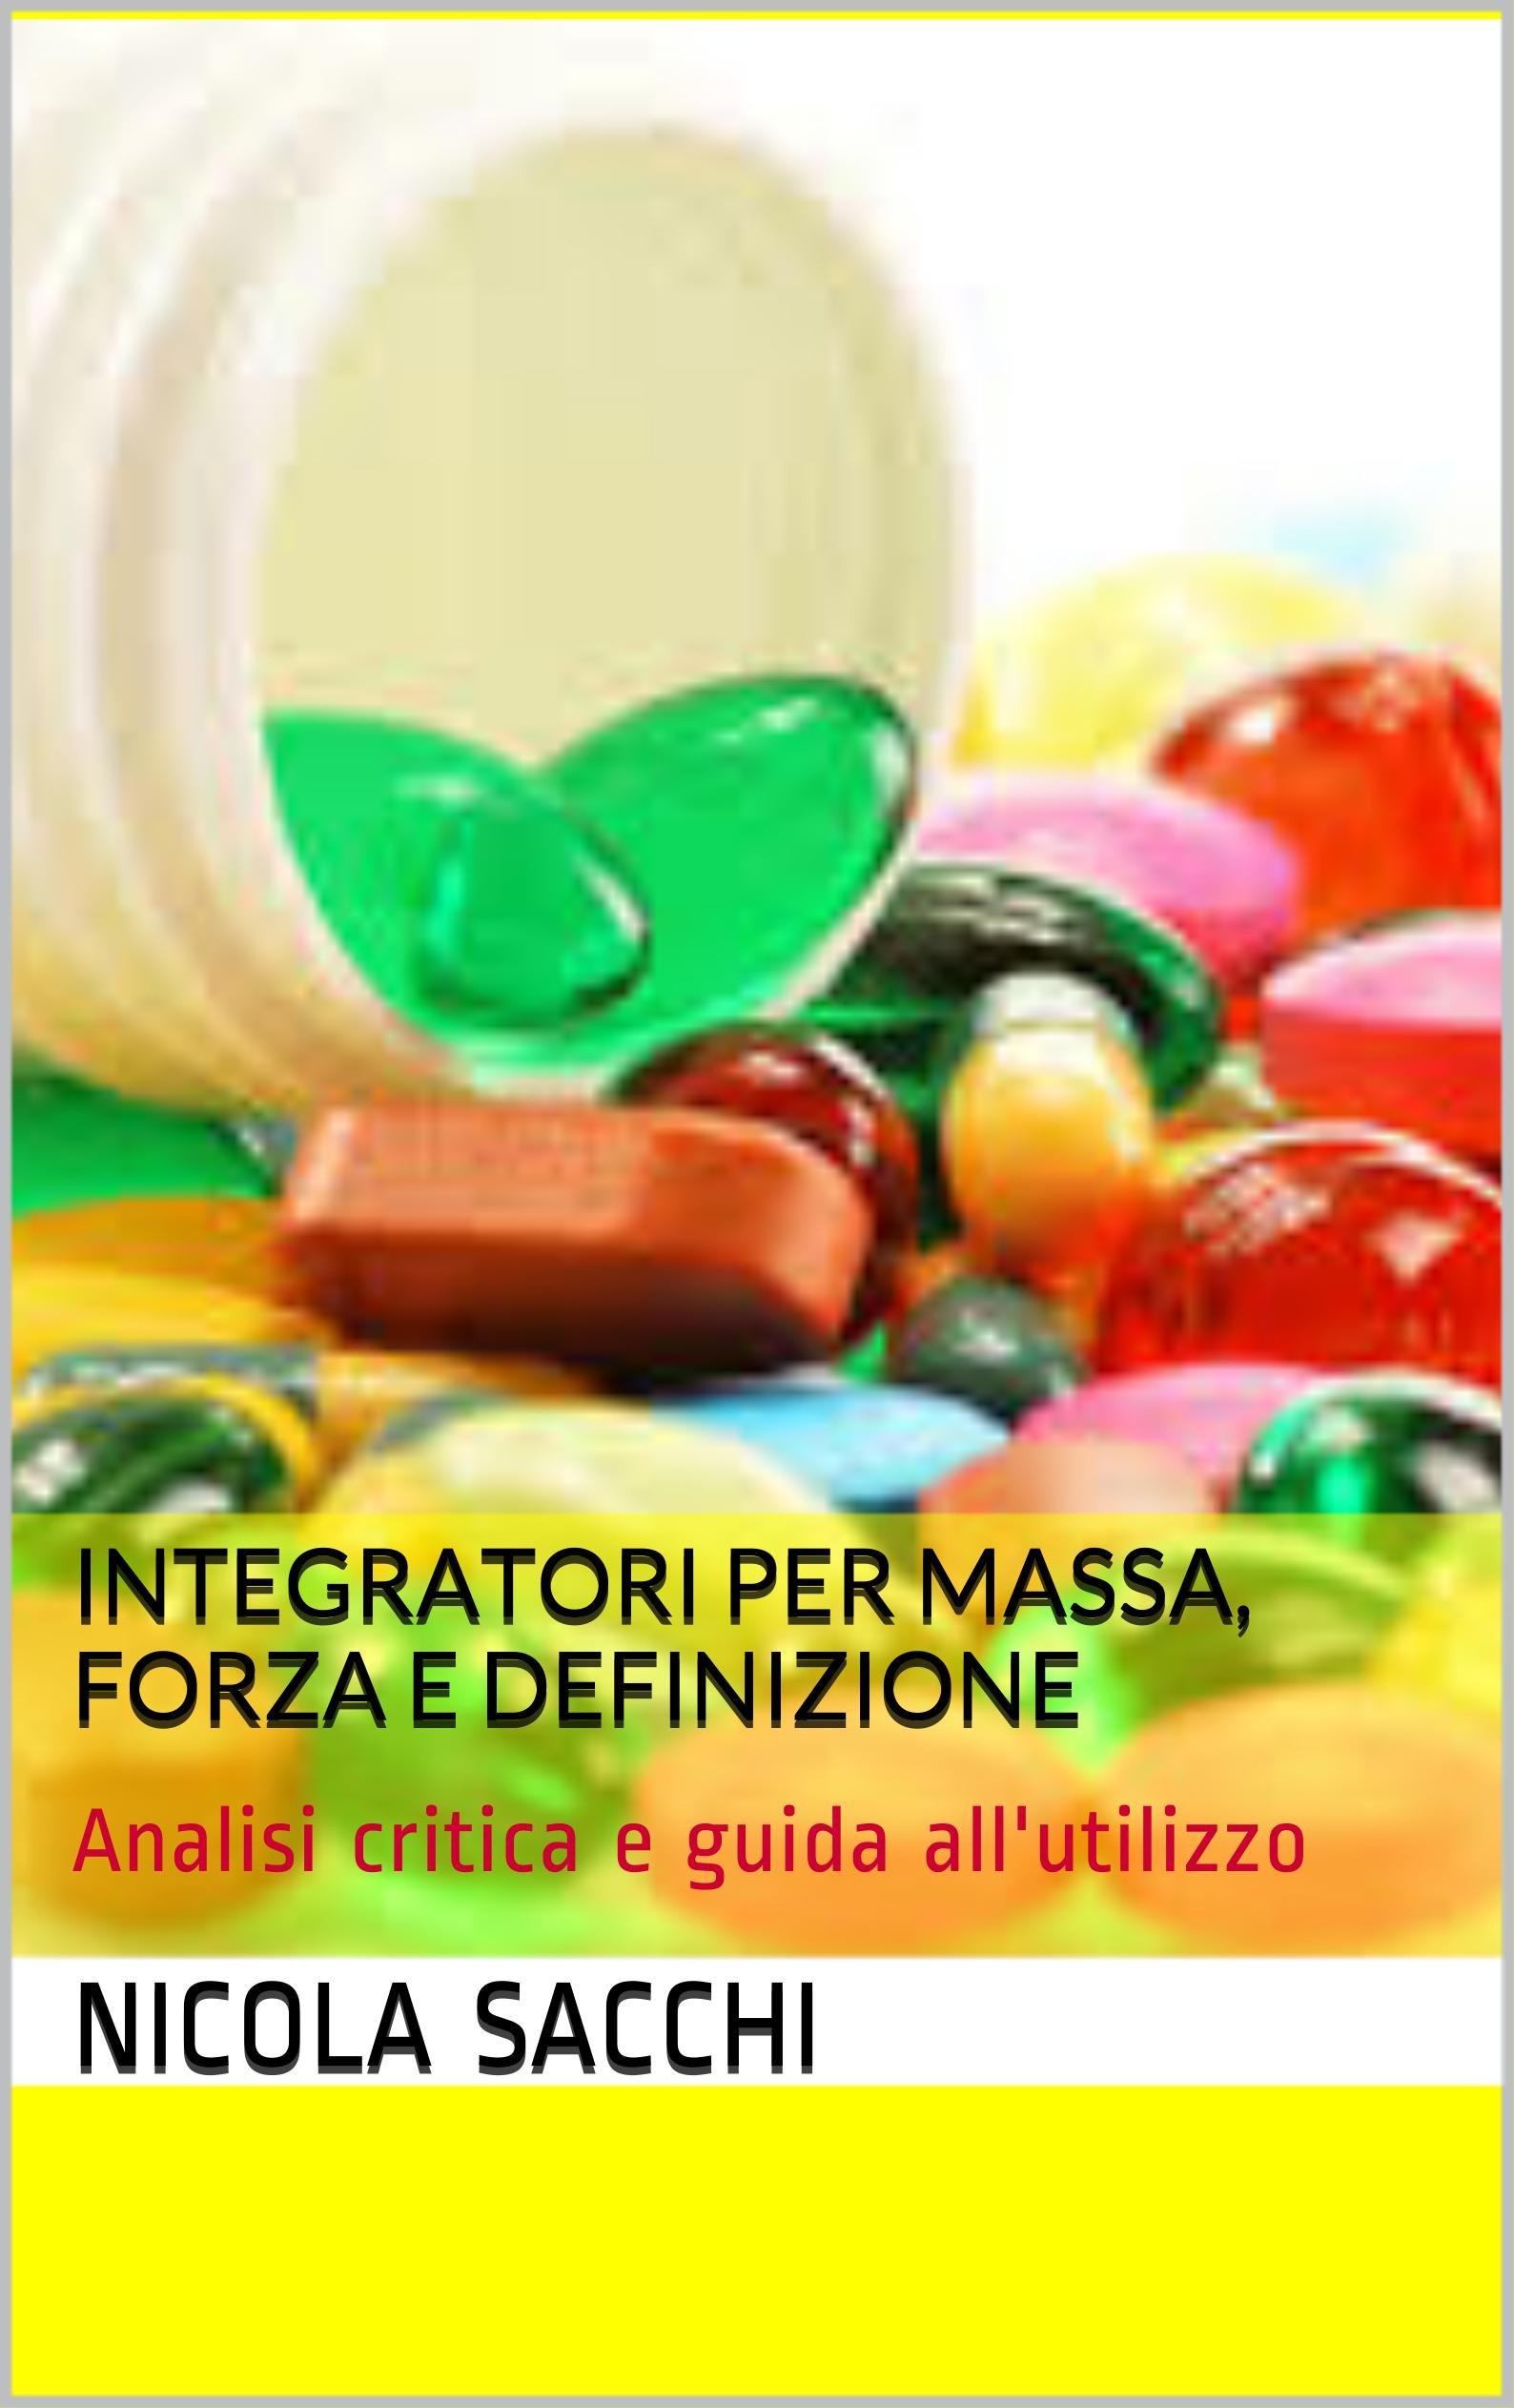 lipitor and b vitamins